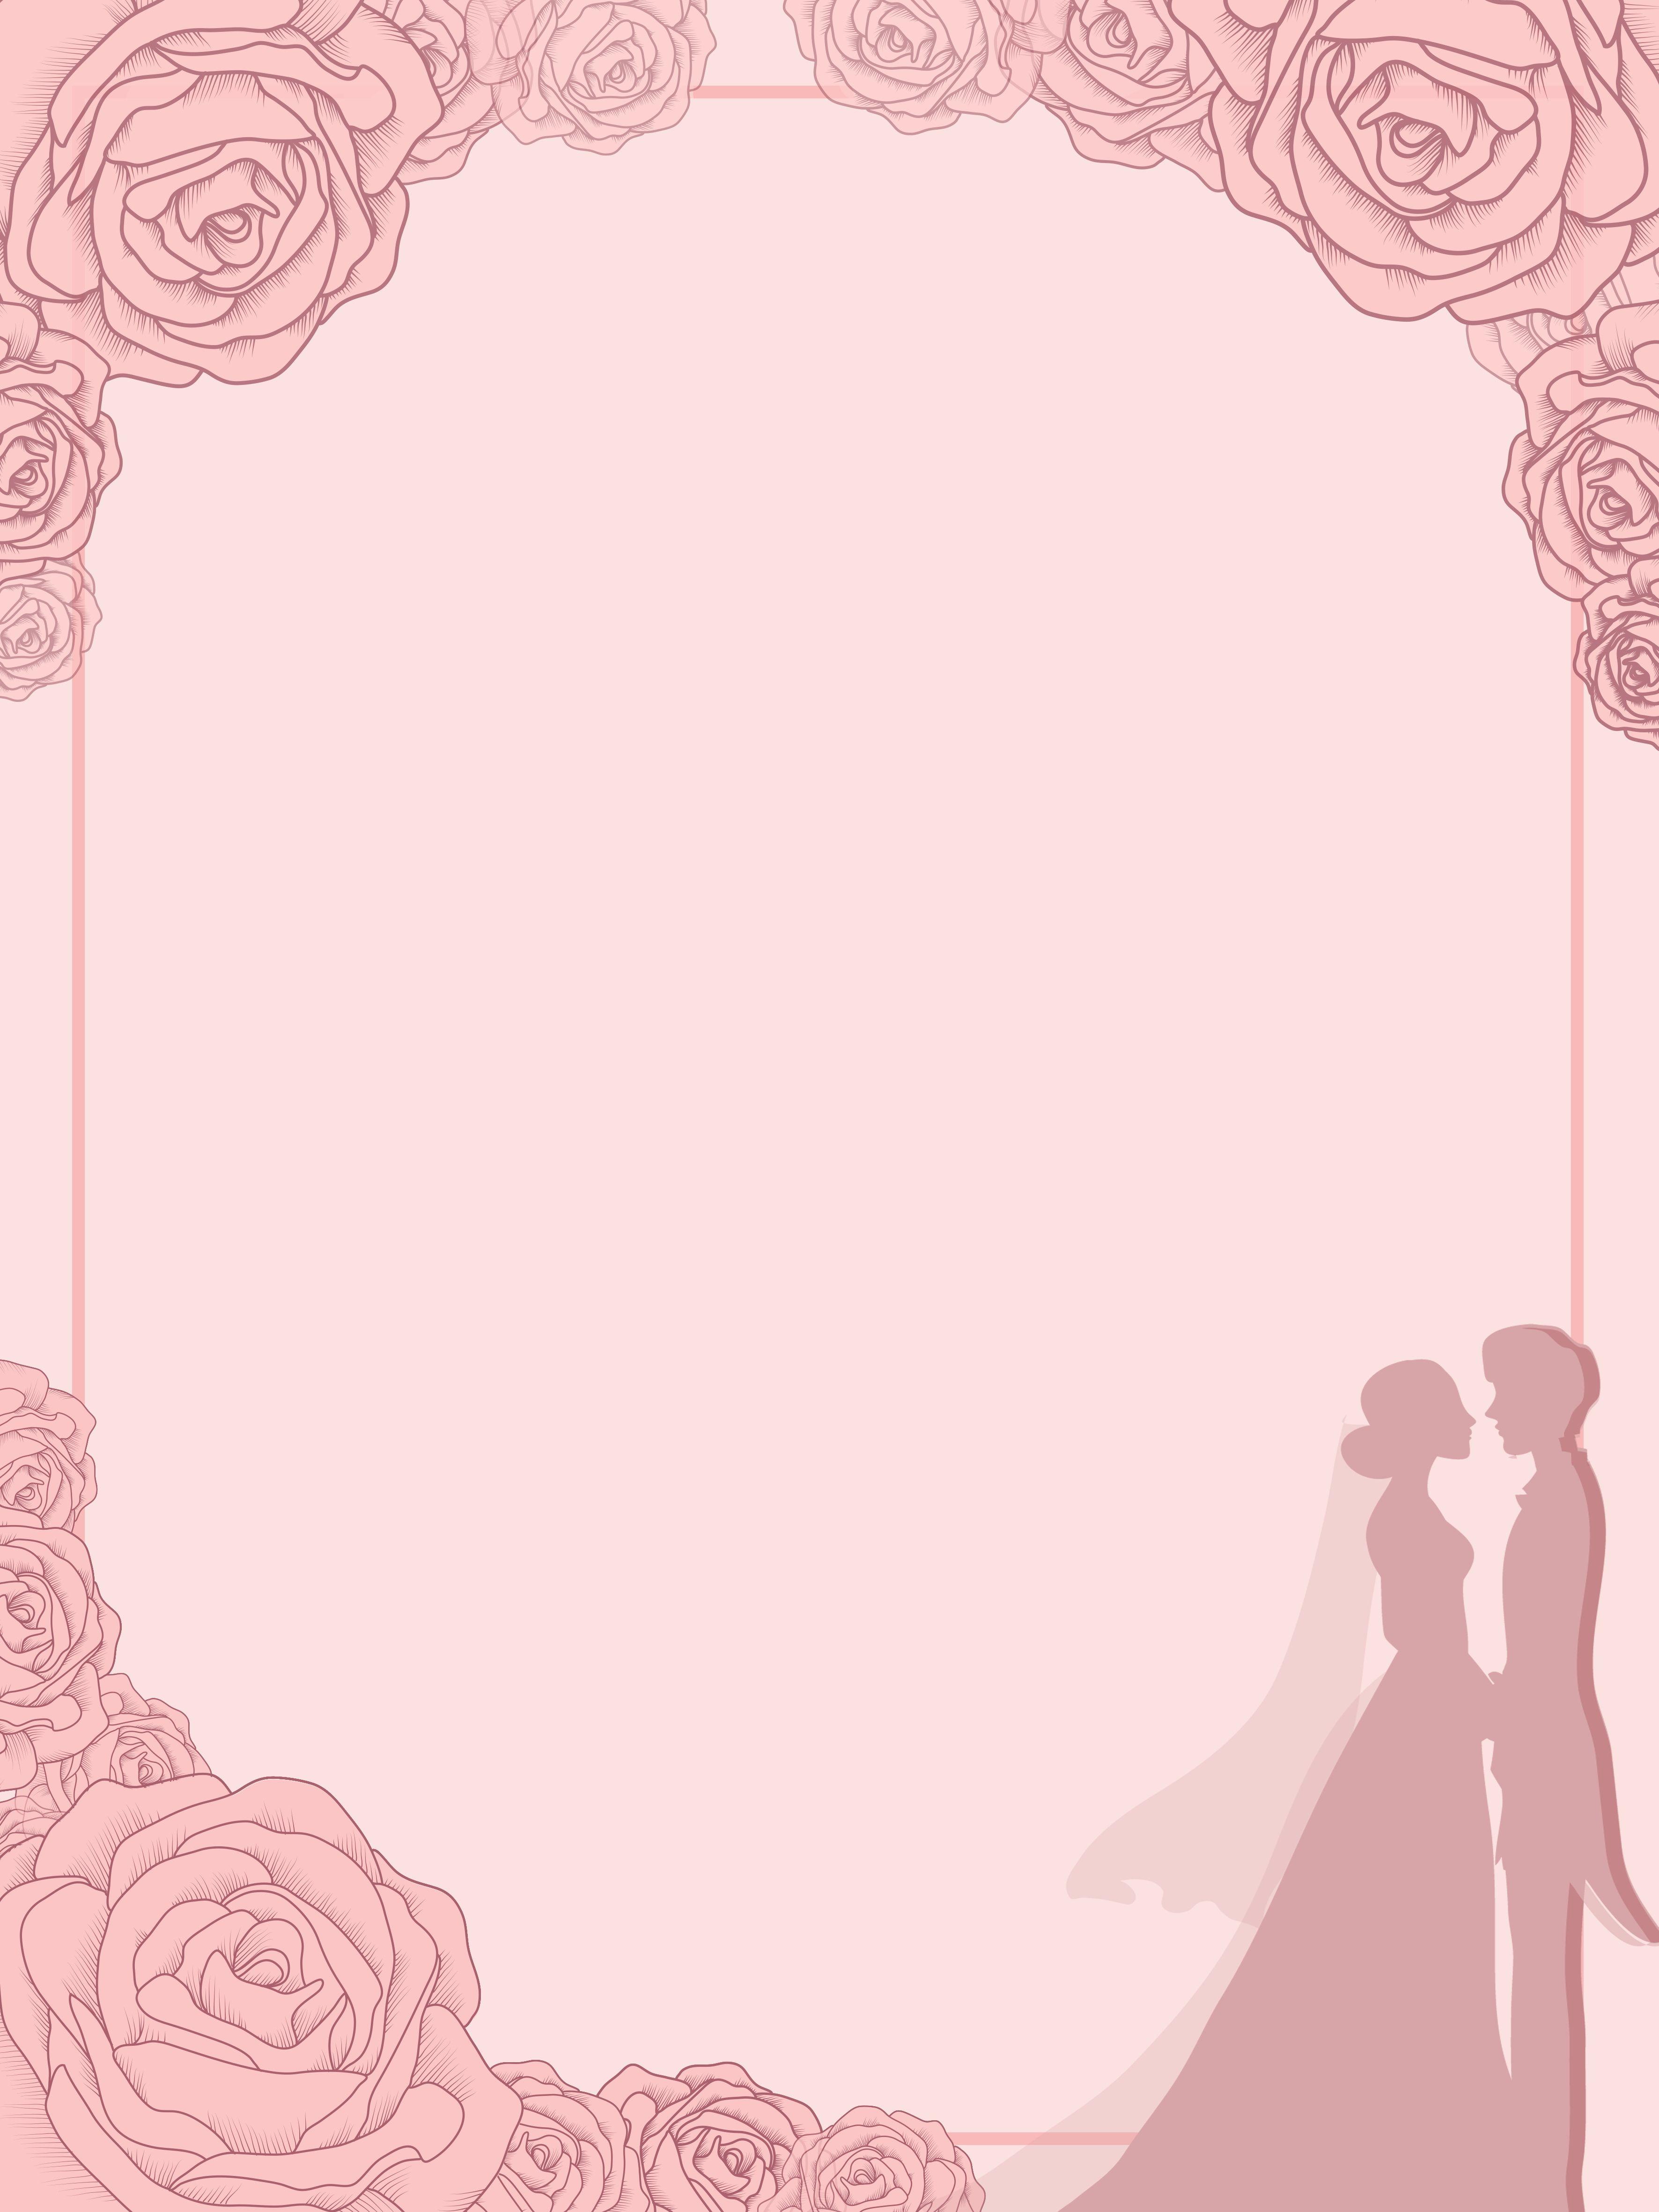 Hand Painted Pink Romantic Wedding Ceremony Invitation Background